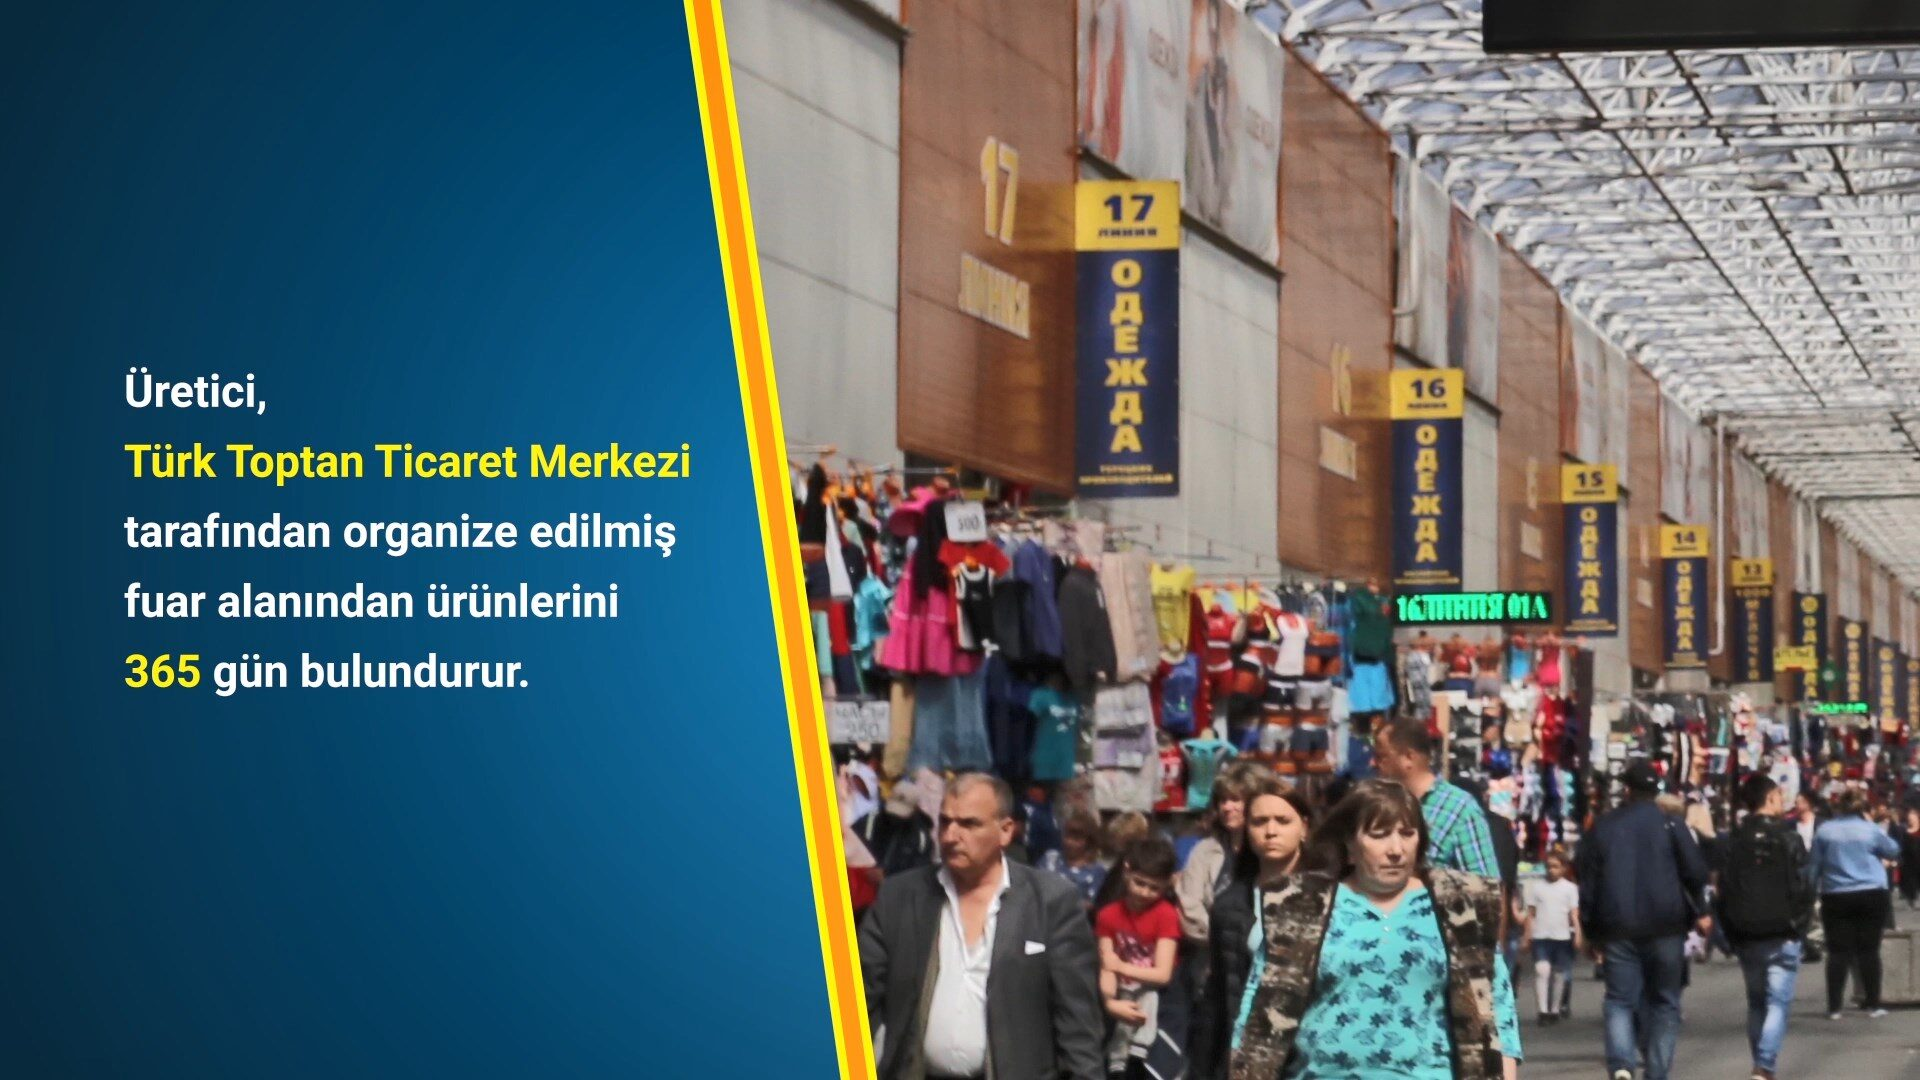 TürkTicaretMerkezi4.mp4 snapshot 00.56.611 1920x1080 -